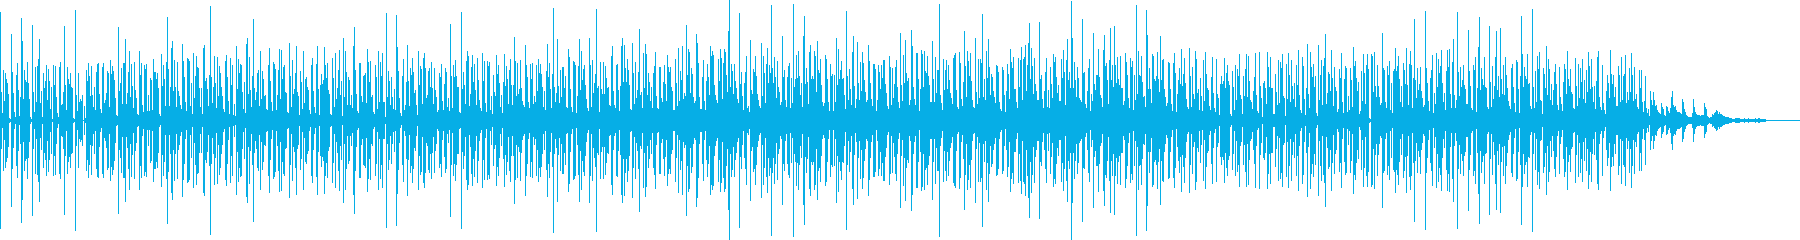 ambientなbreakbeatsですの再生済みの波形